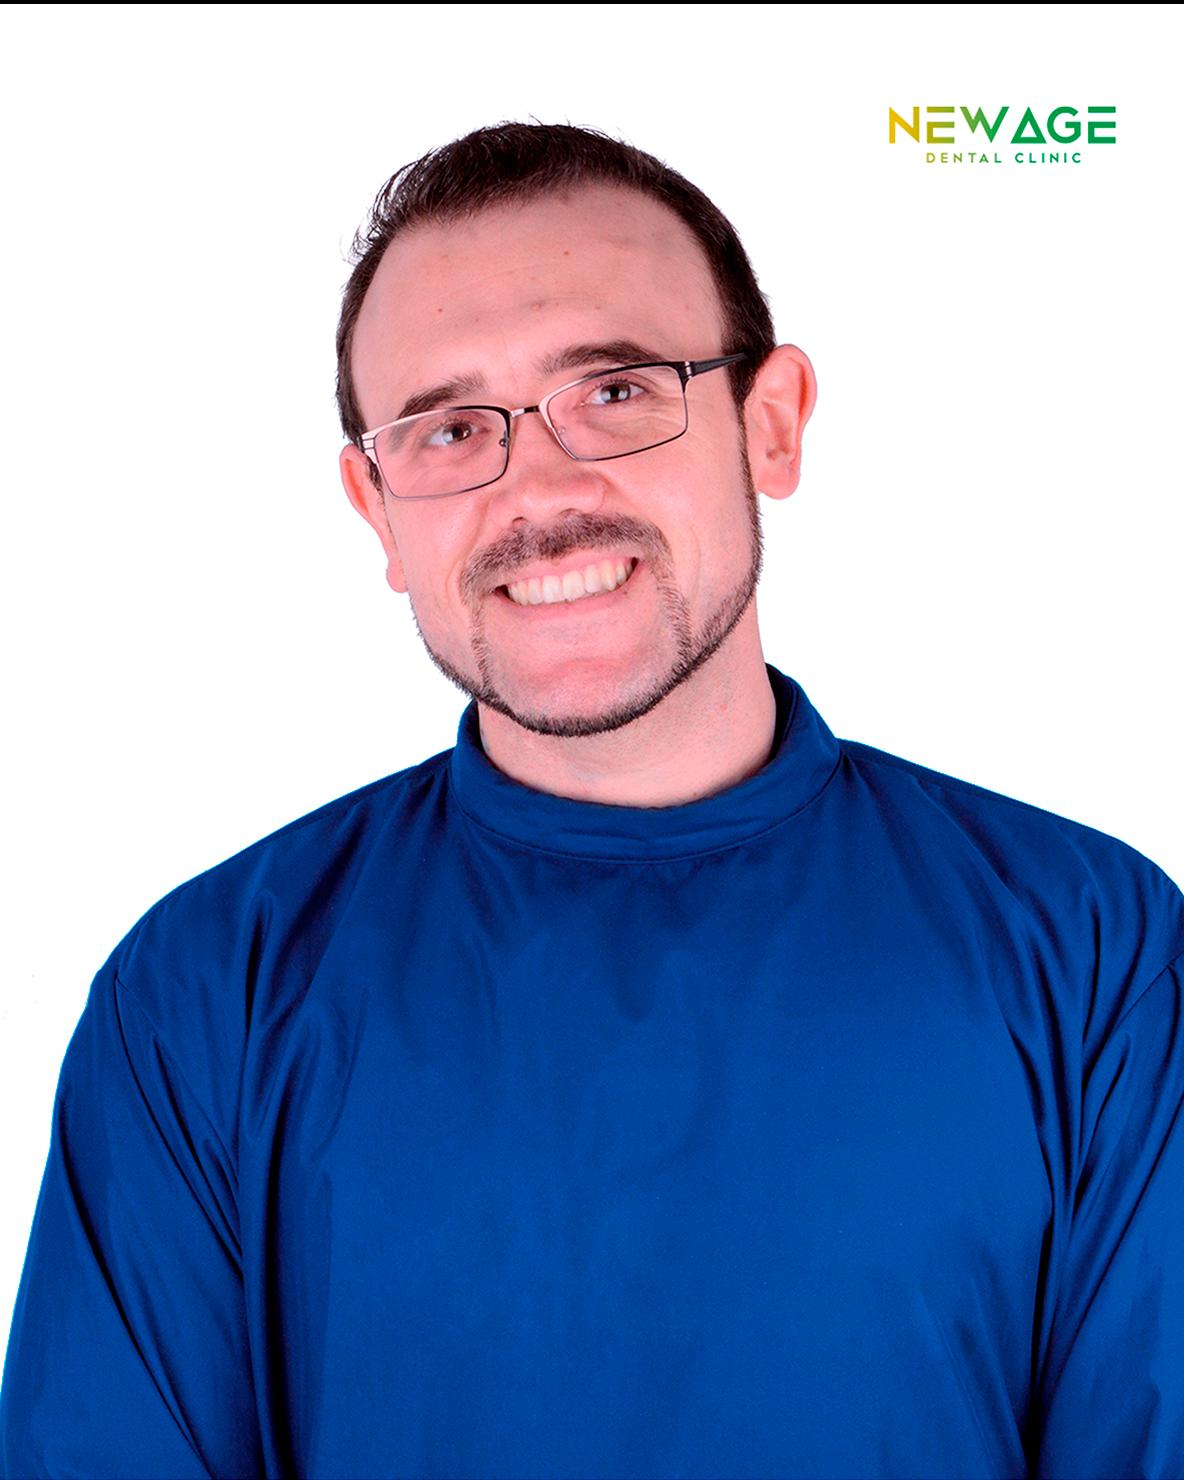 Dr. Roberto Rivera, Periodontics Specialist at New Age Dental Clinic in Tijuana